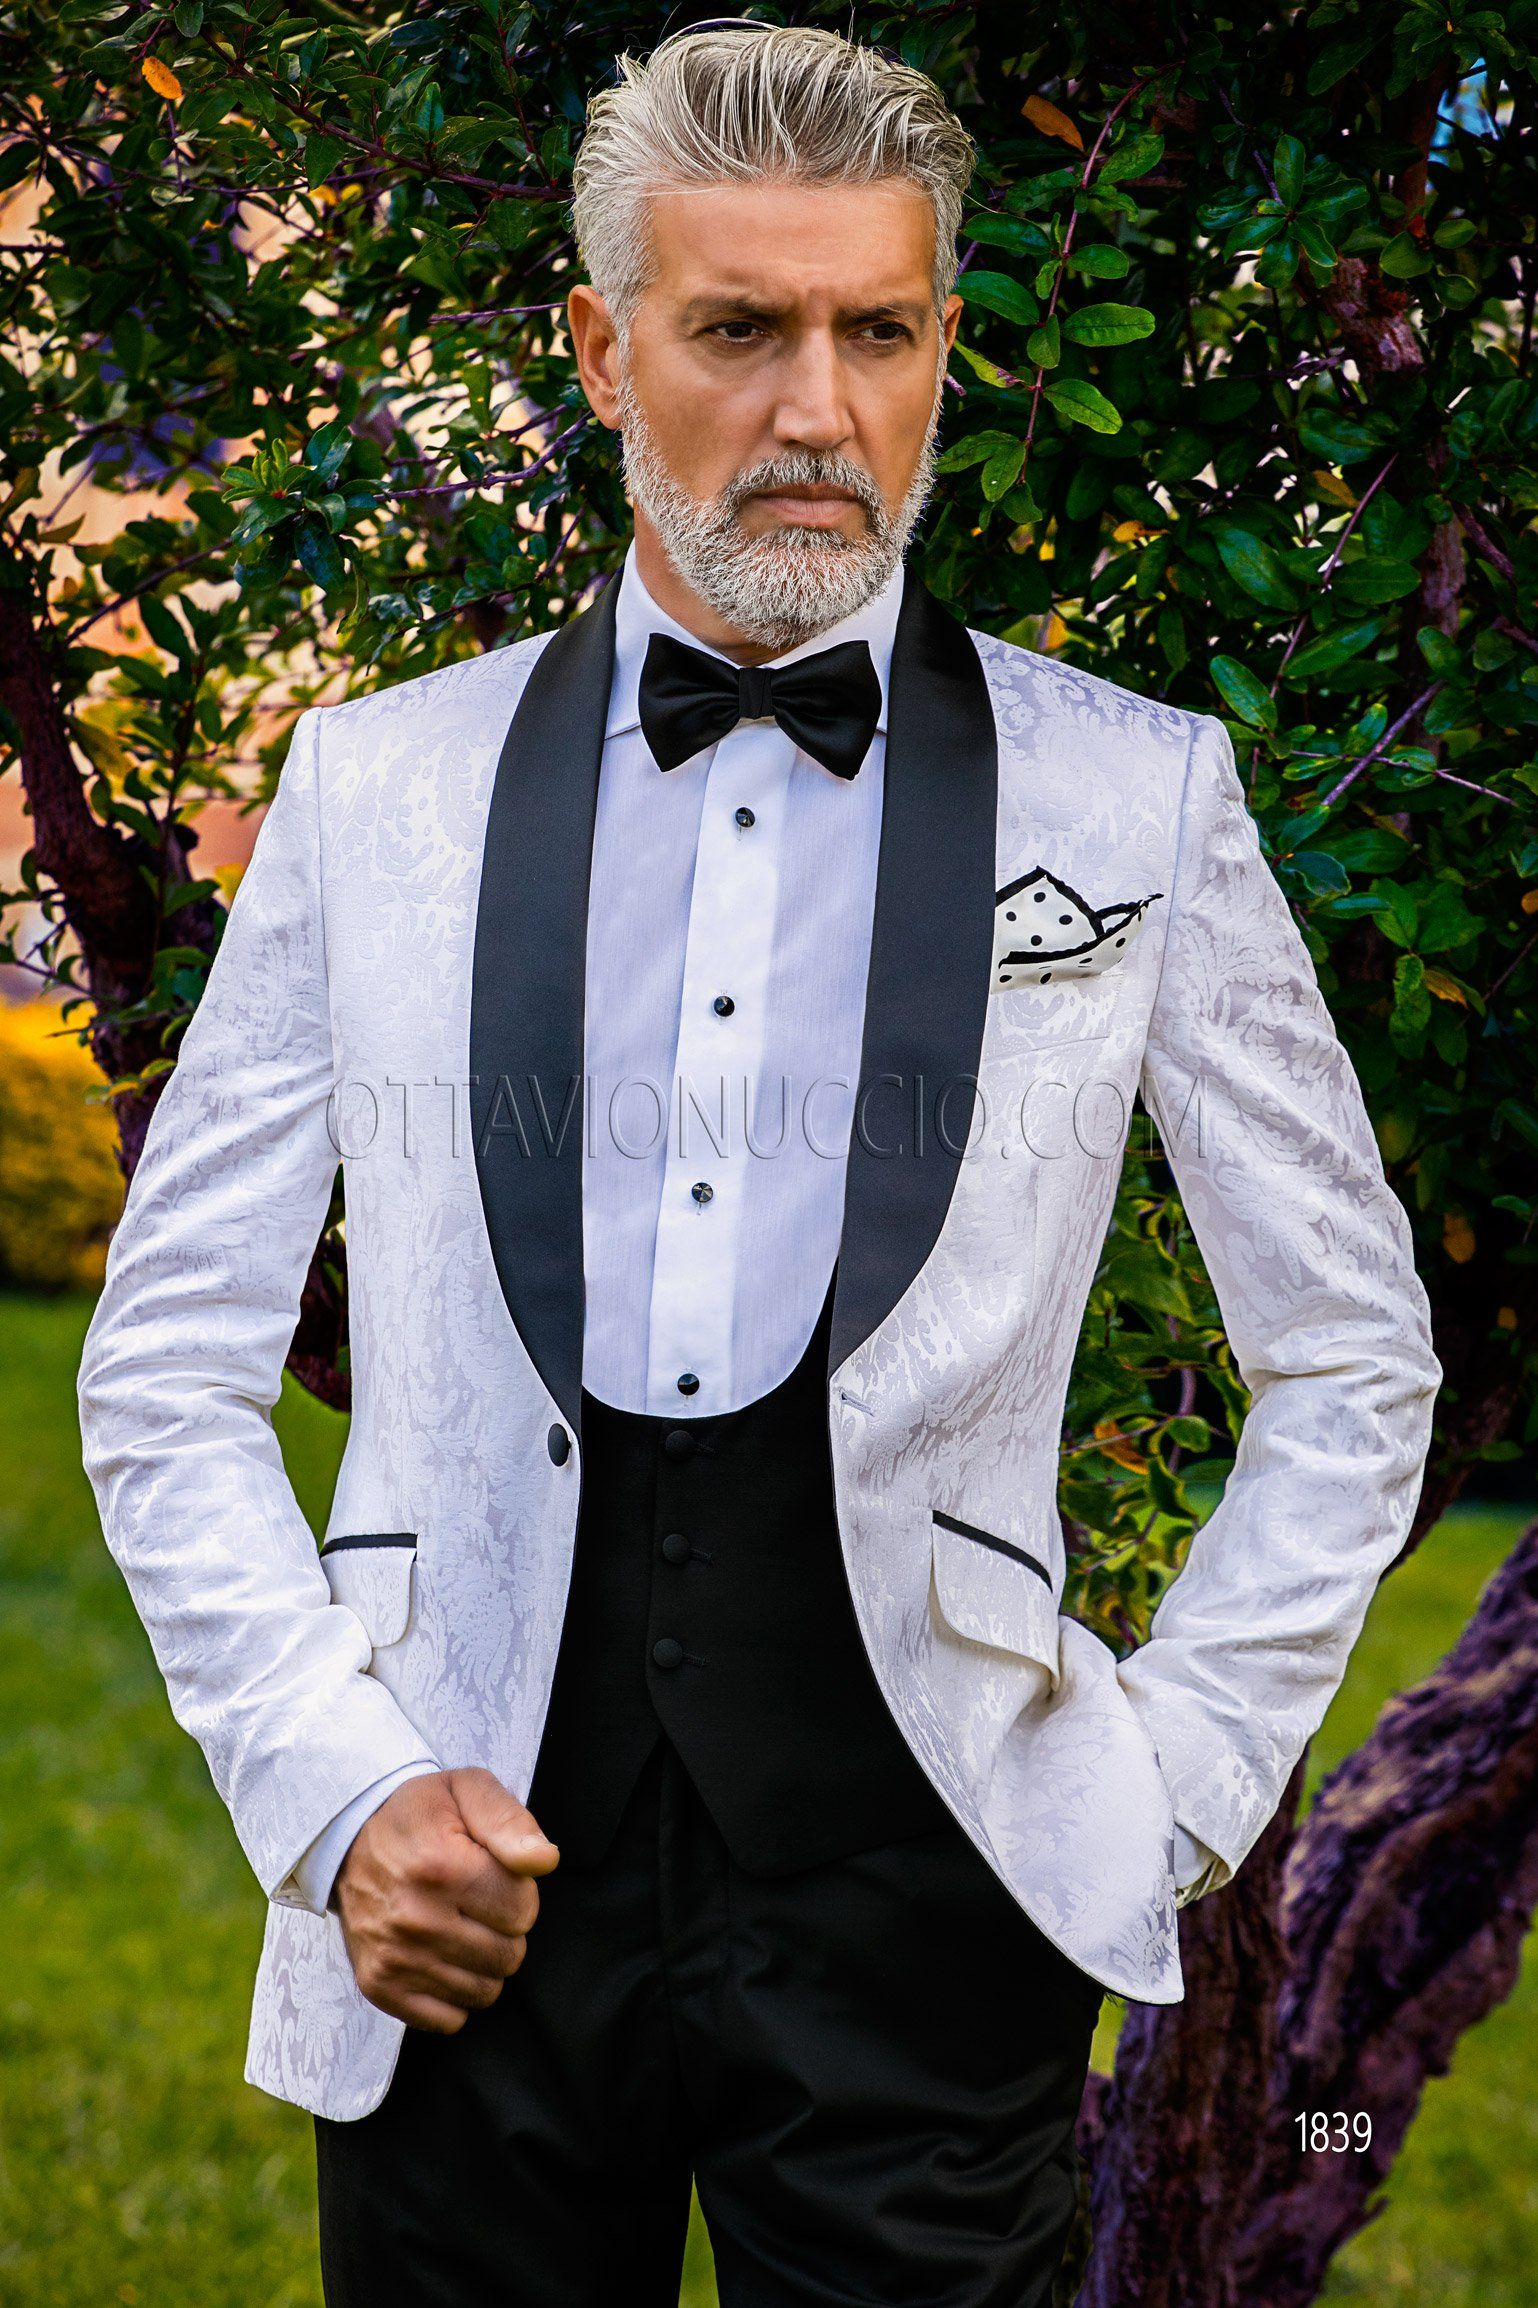 Black and white shawl blacktie tuxedo #wedding #groom #suit #luxury ...